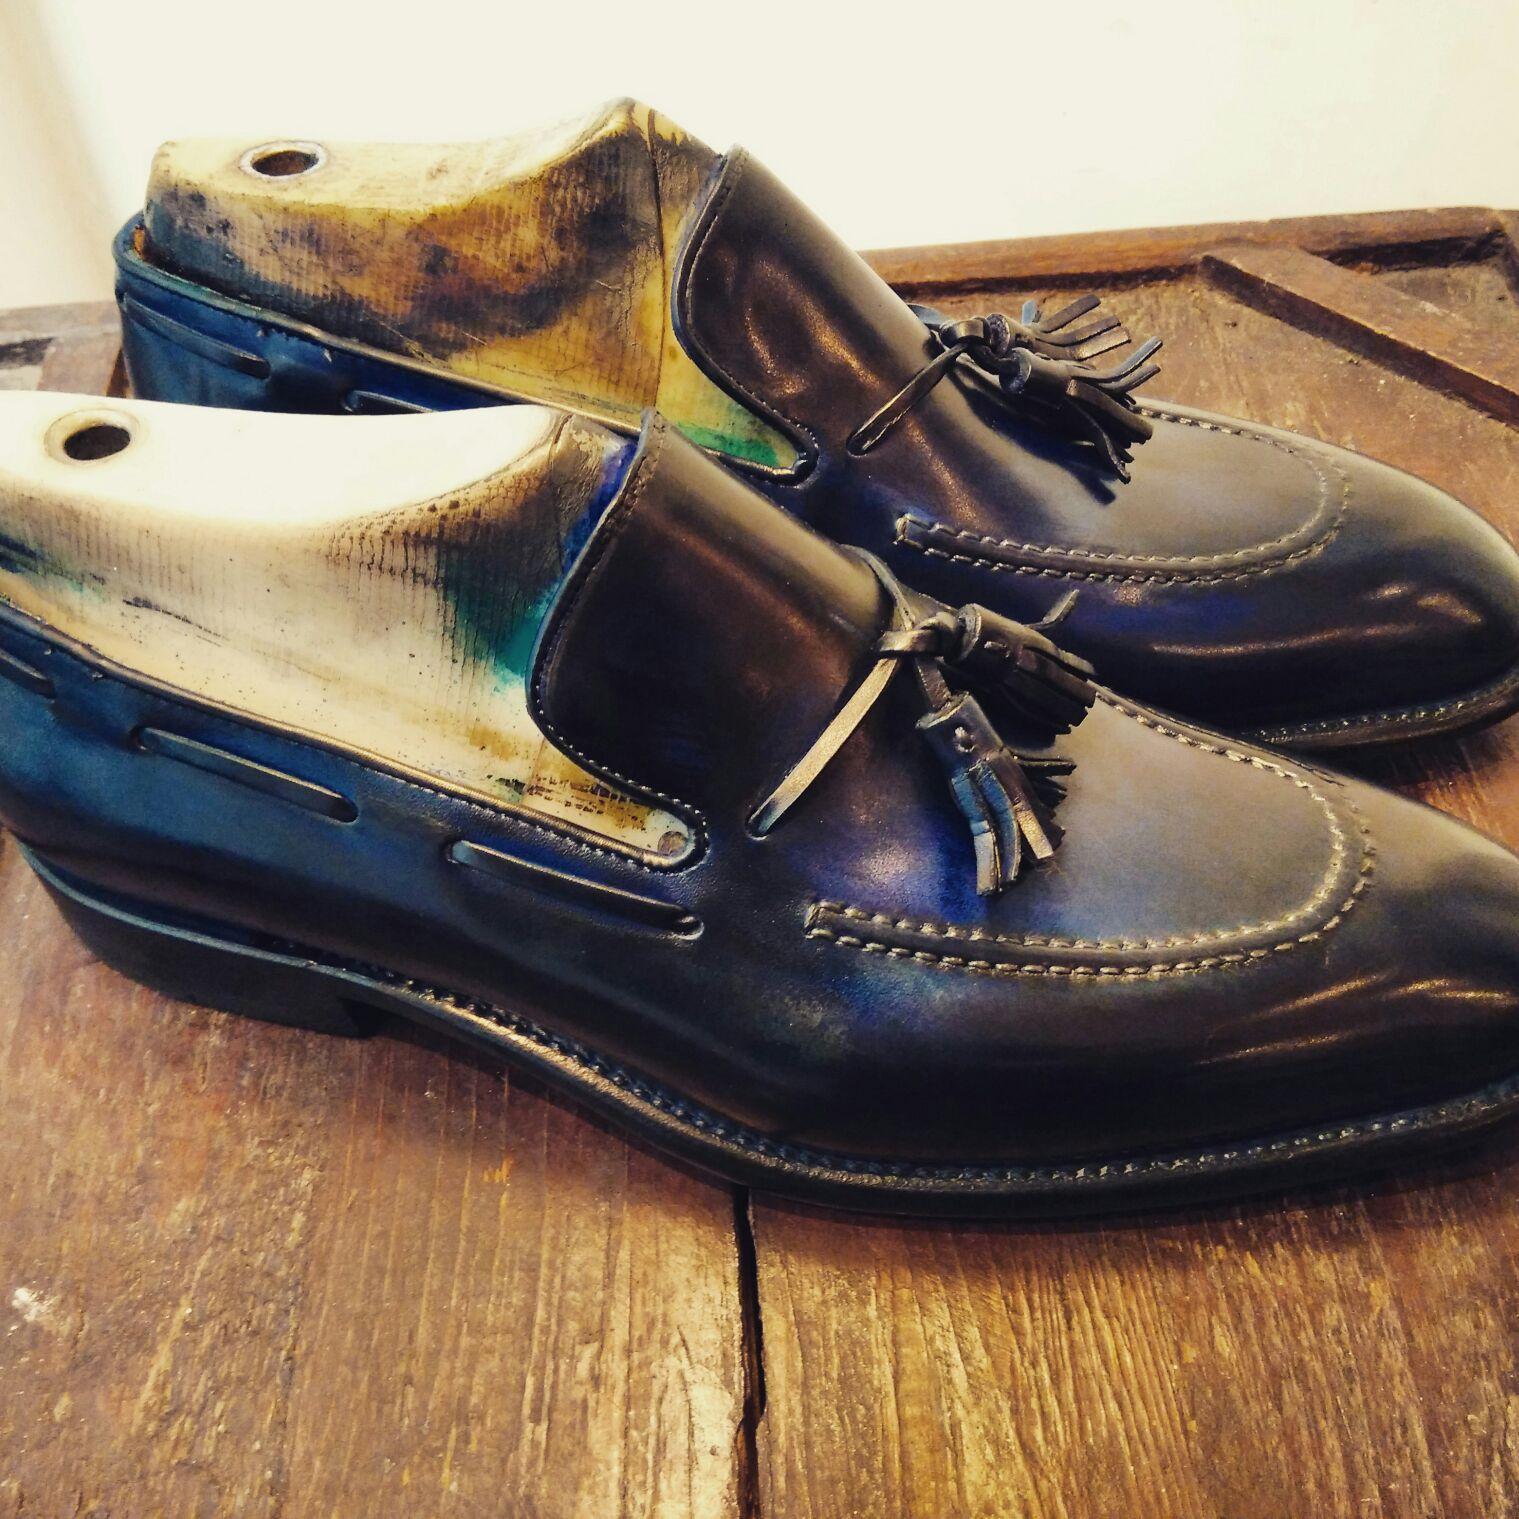 Scarpe eleganti da uomo Giordano 048 Firenze